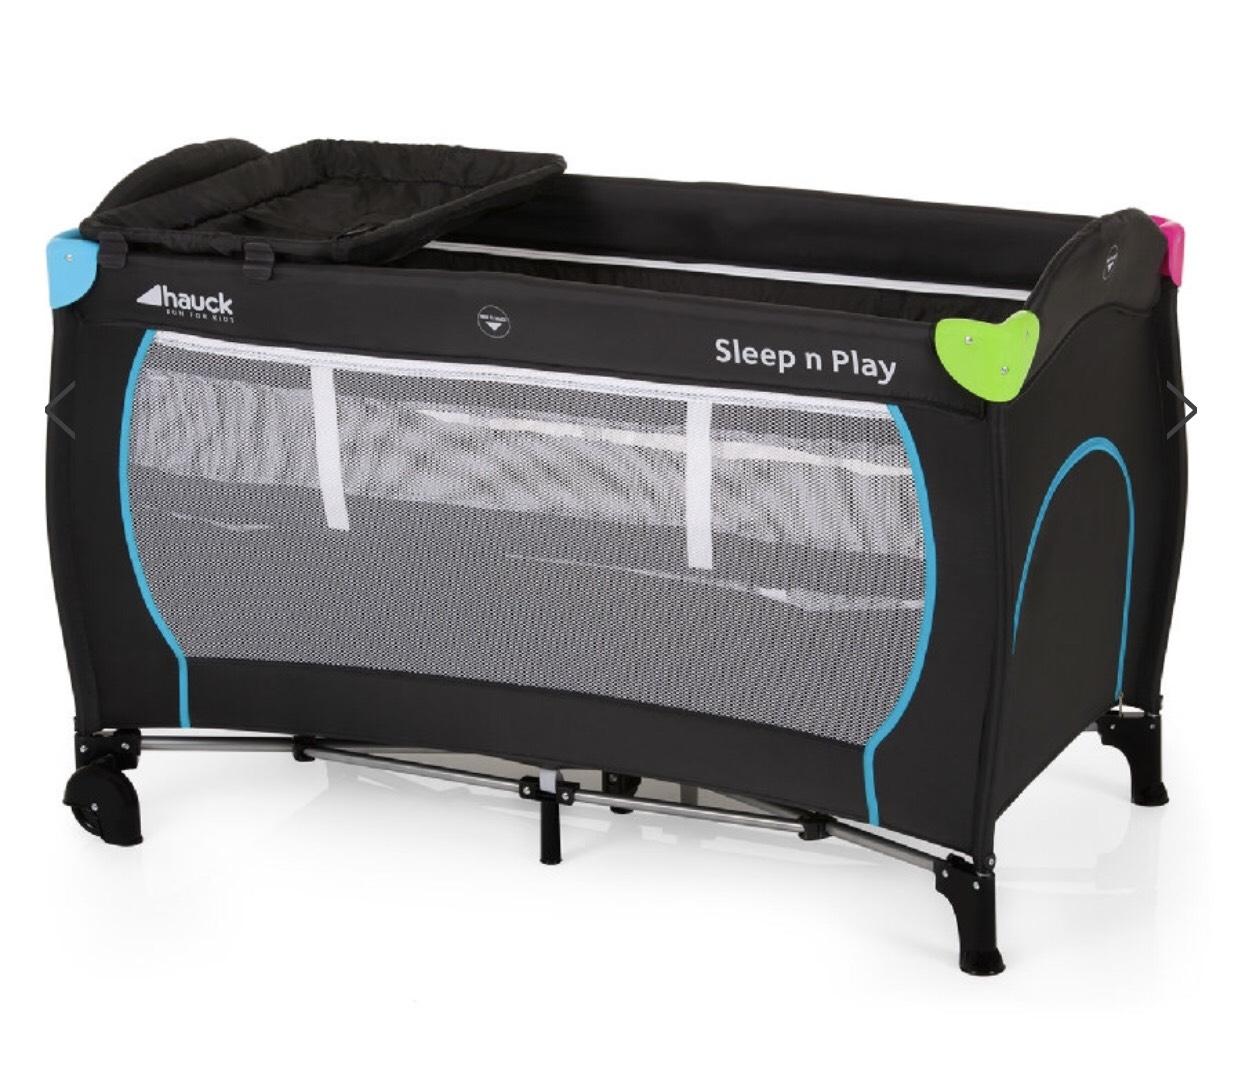 hauck Baby Reisebett Sleep'n Play Center Multicolor Black